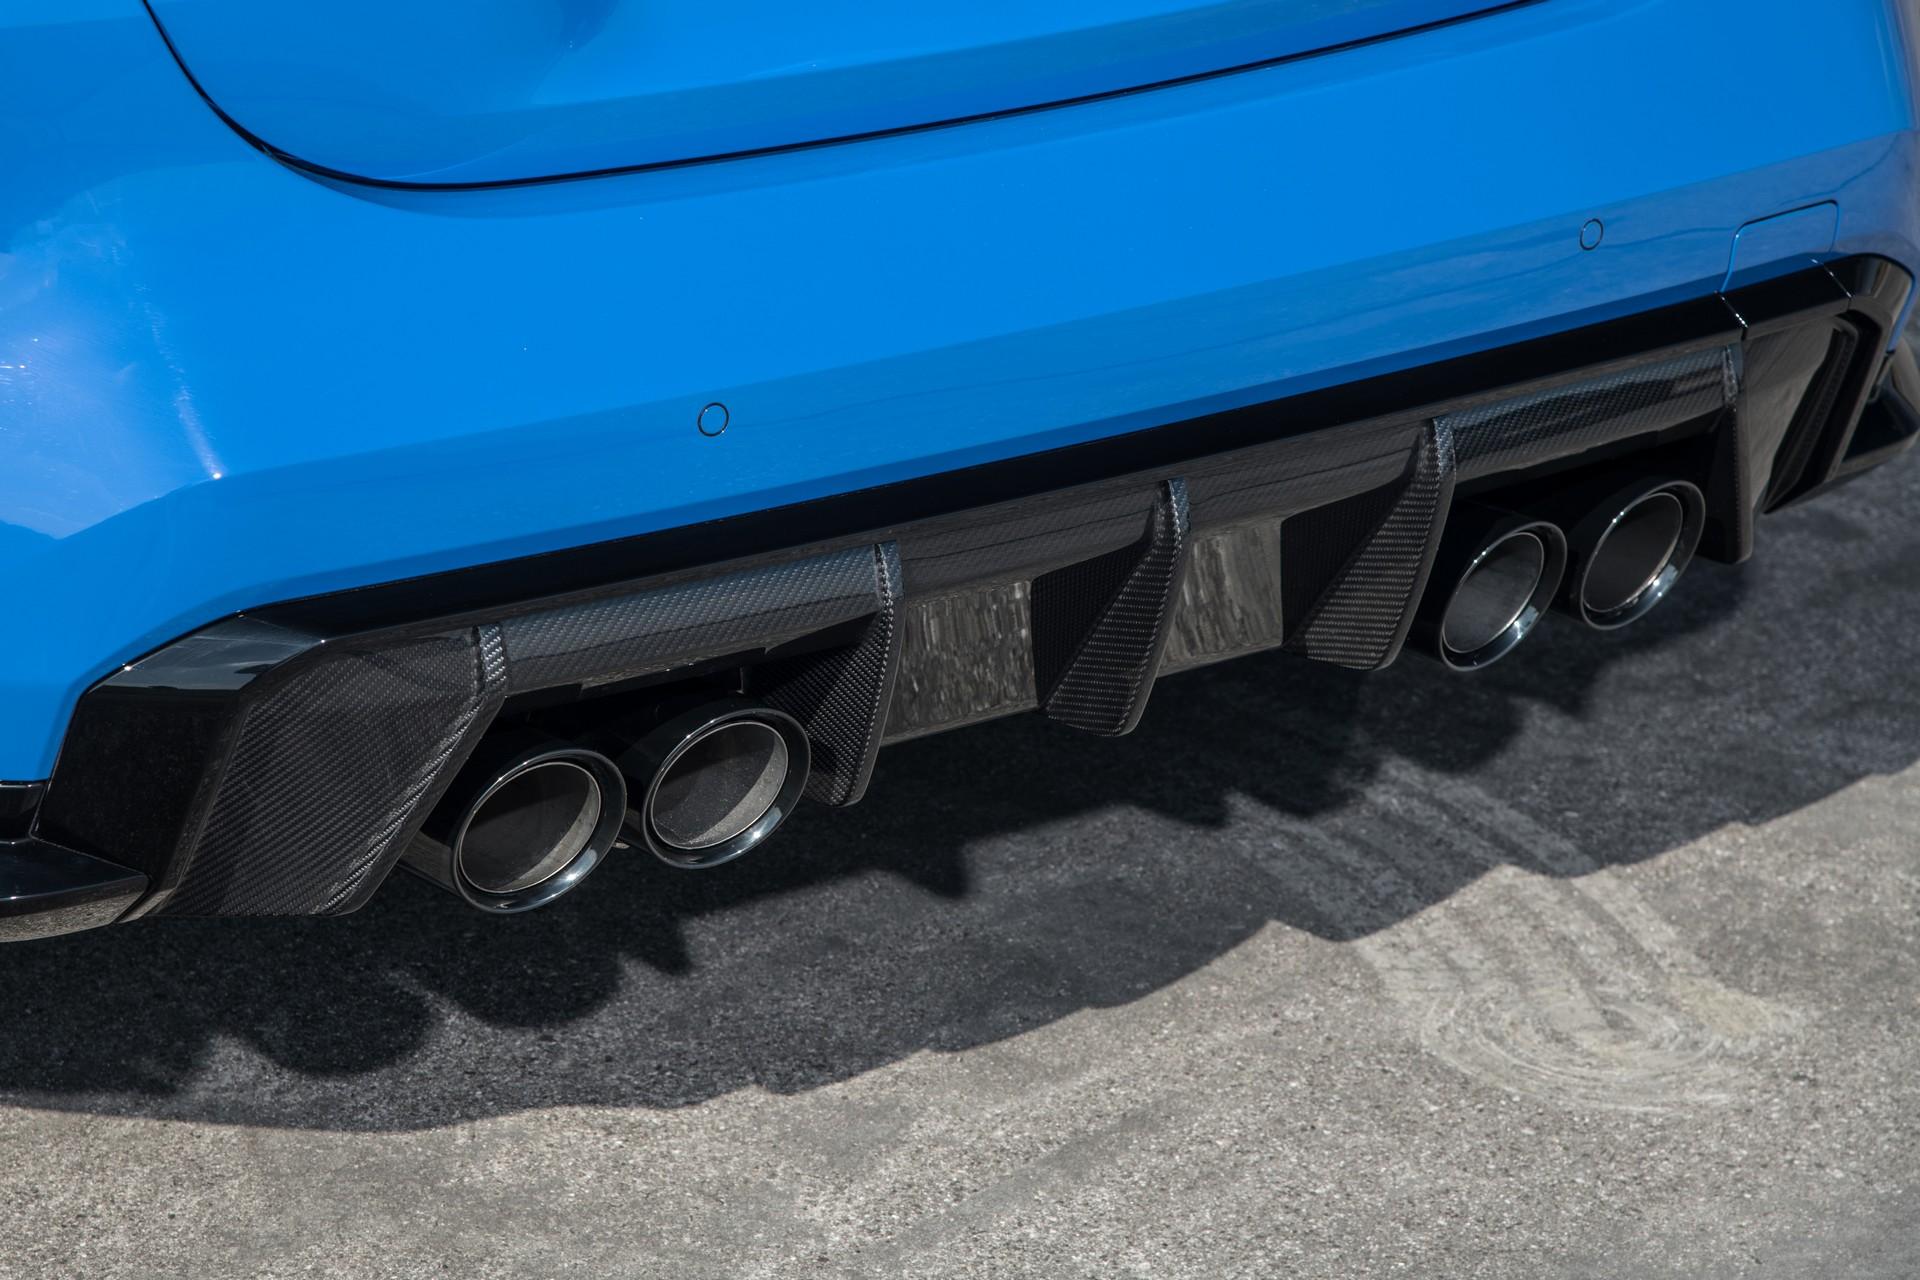 BMW-M3-M4-Competition-xDrive-38.jpg